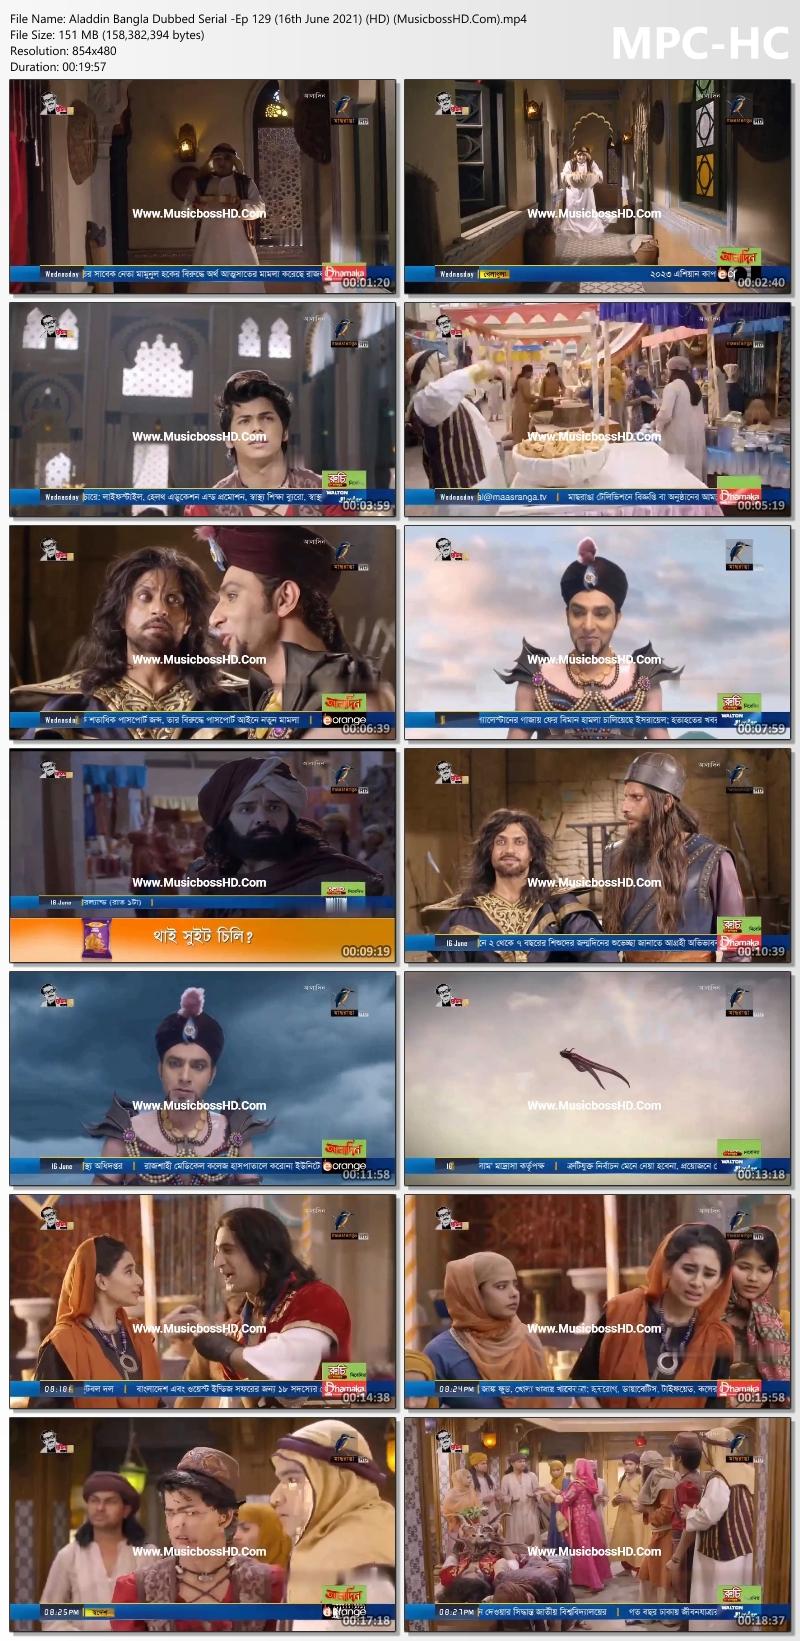 Aladdin-Bangla-Dubbed-Serial-Ep-129-16th-June-2021-HD-Musicboss-HD-Com-mp4-thumbs